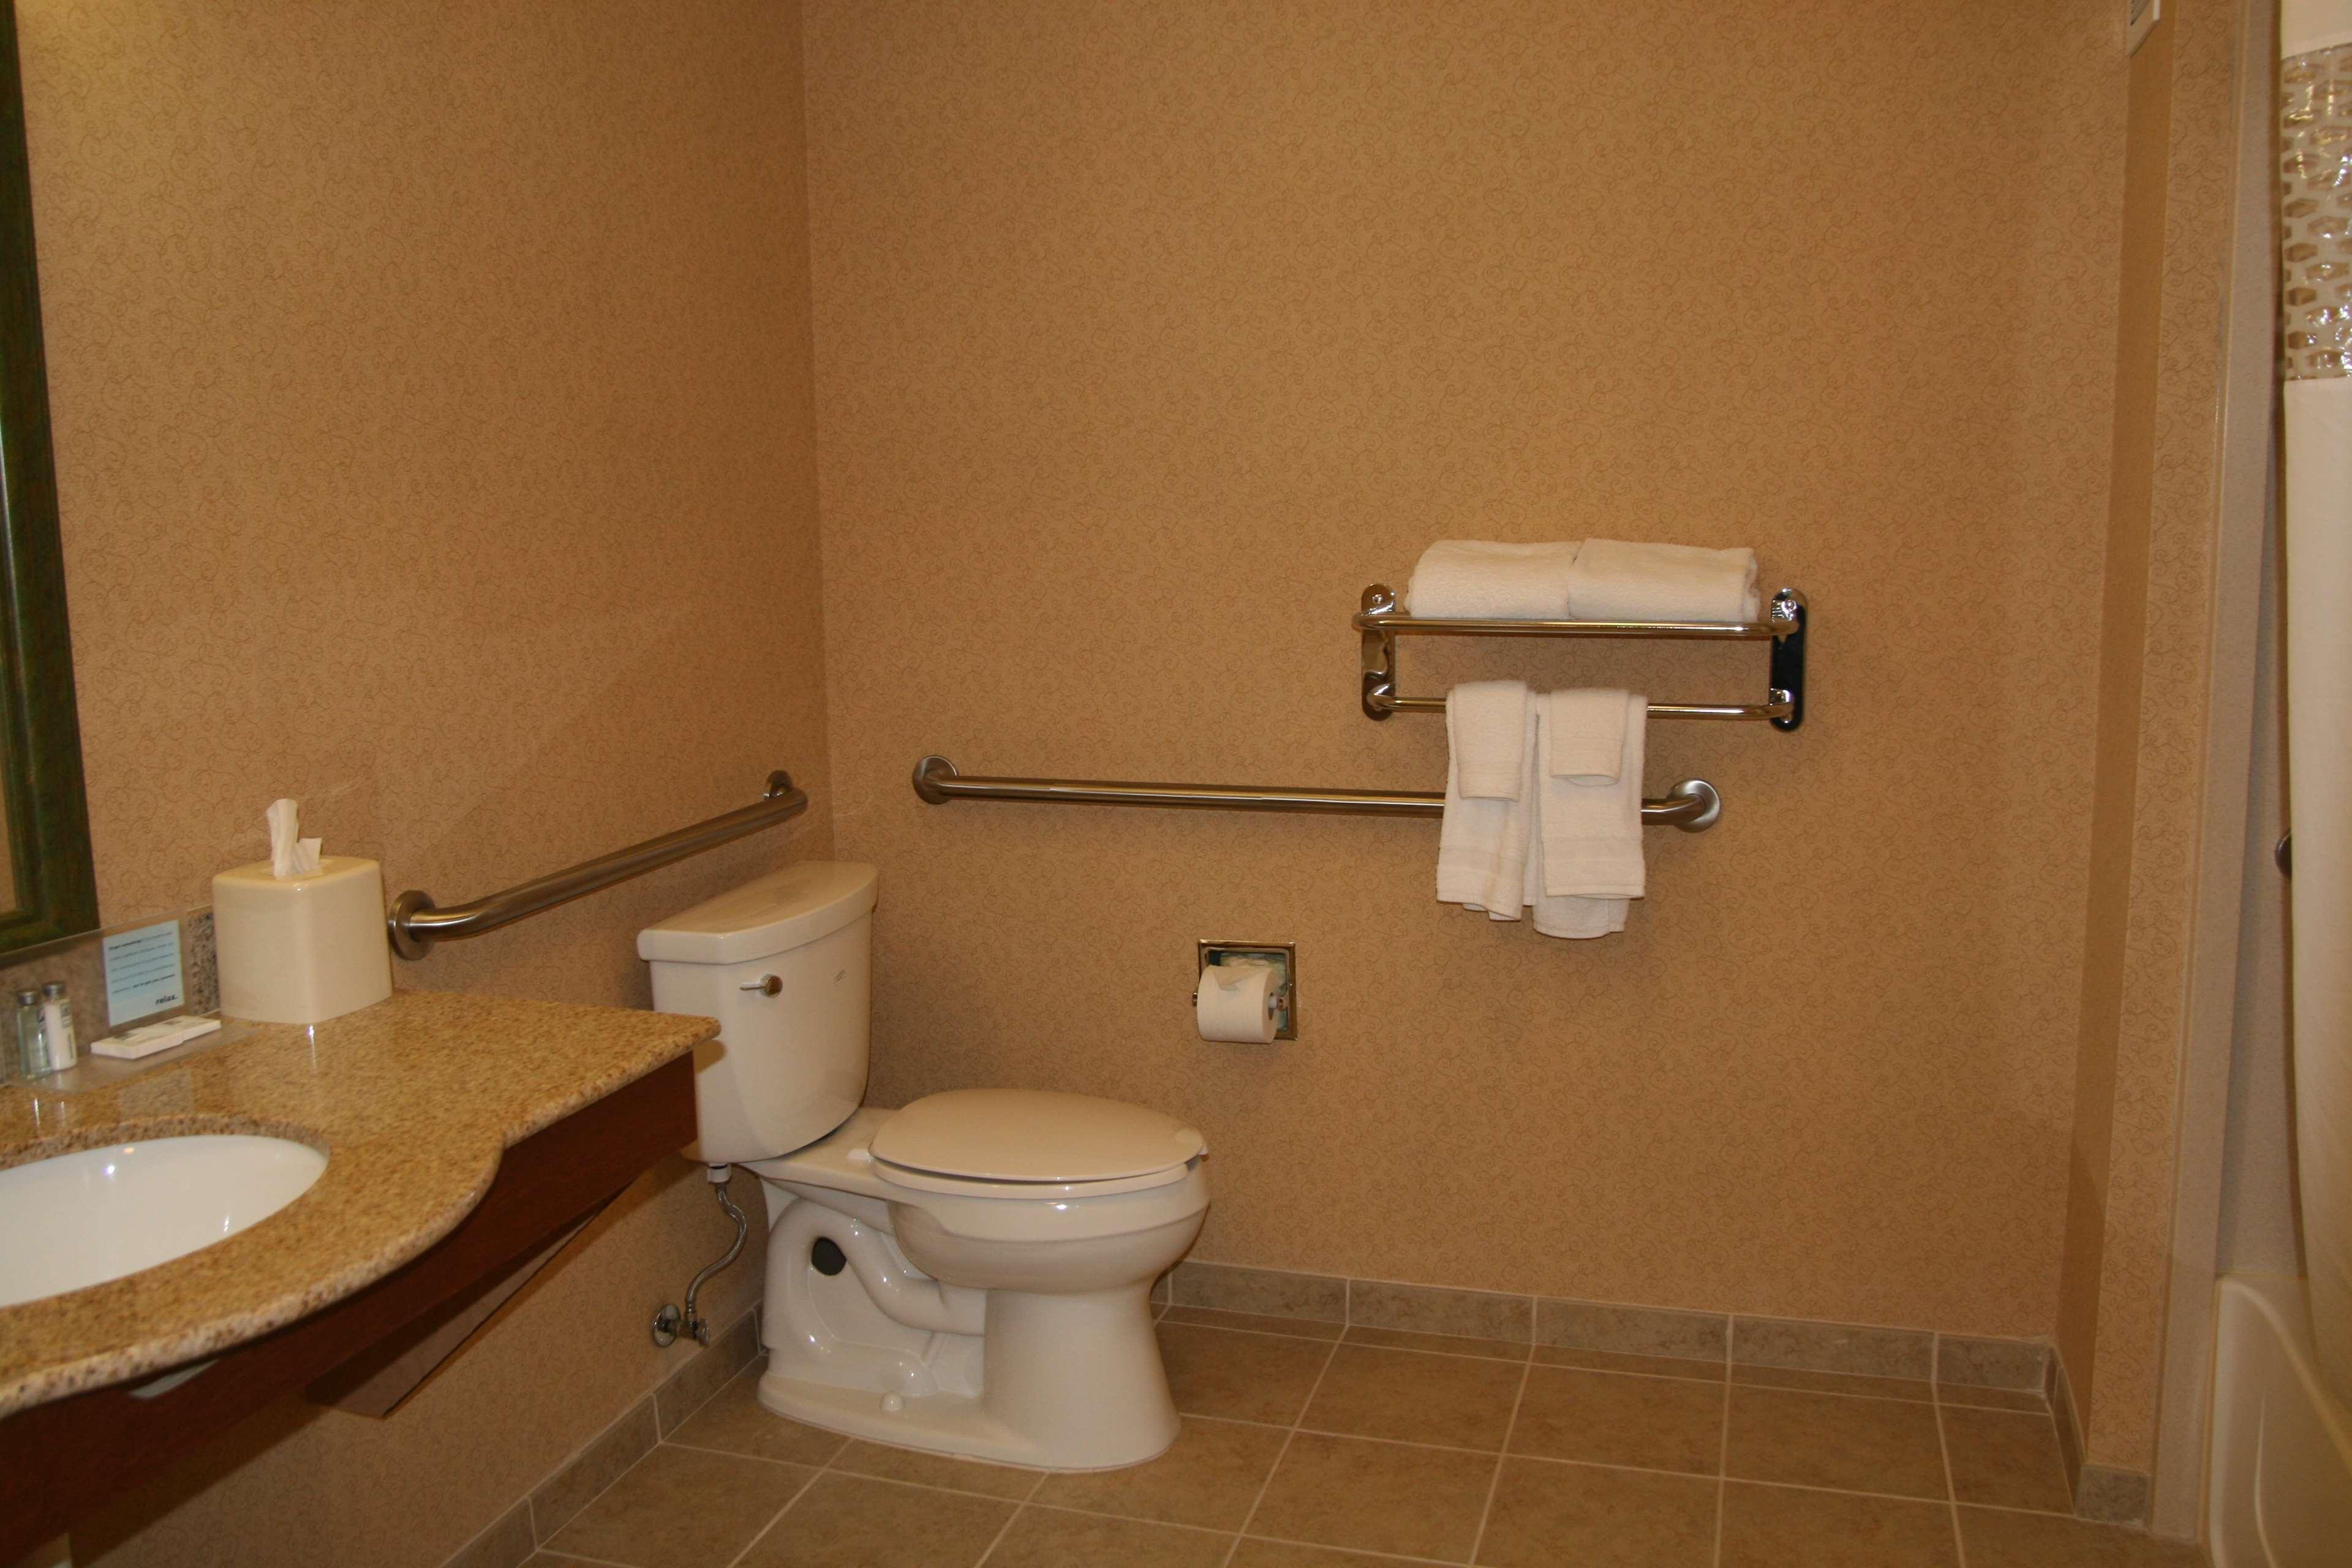 Hampton Inn & Suites Rohnert Park - Sonoma County image 9